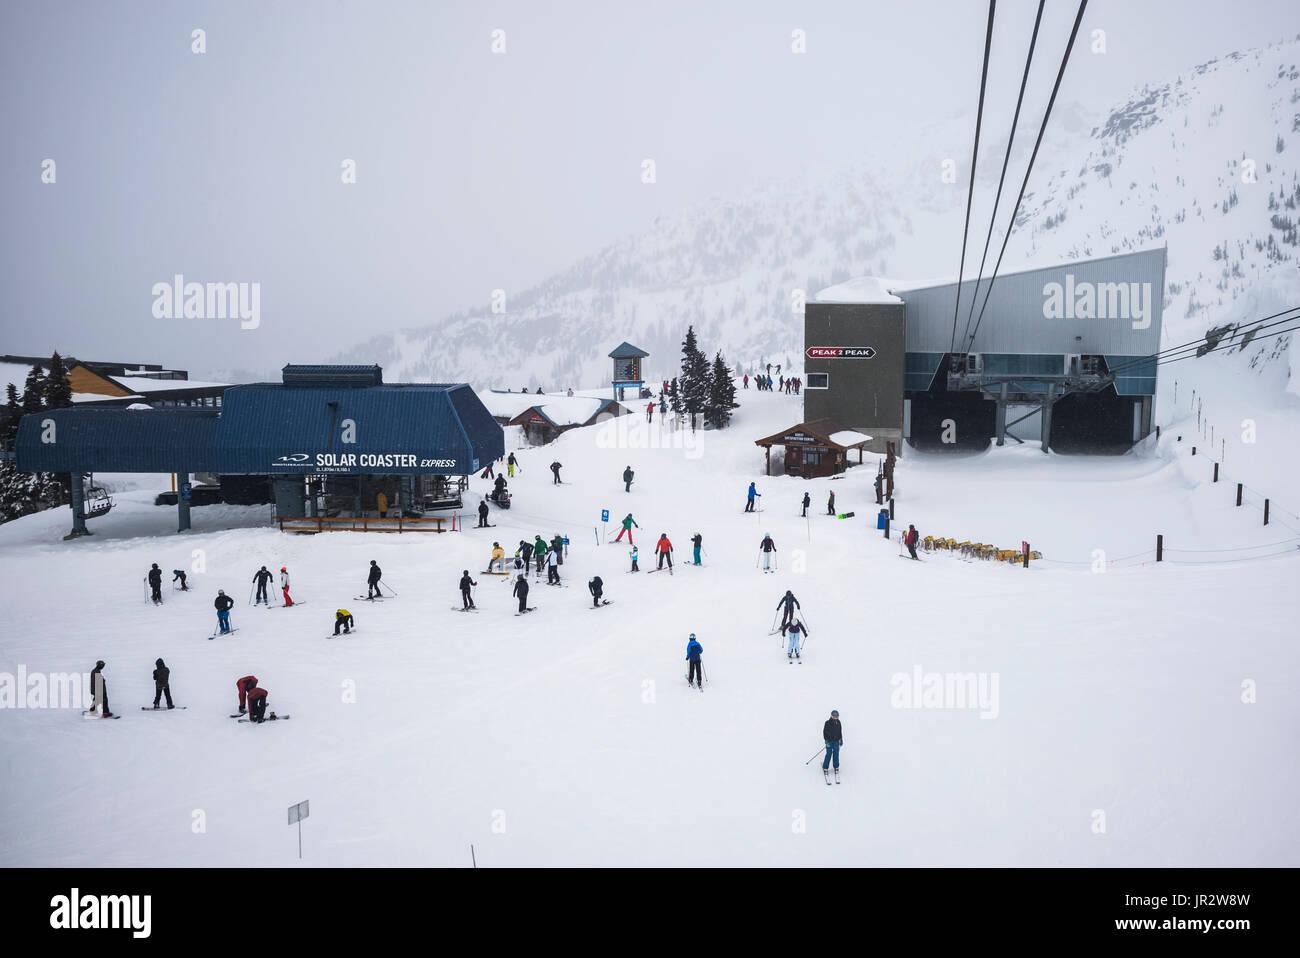 Abfahrt Skifahrer im Skigebiet, Whistler, British Columbia, Kanada Stockbild